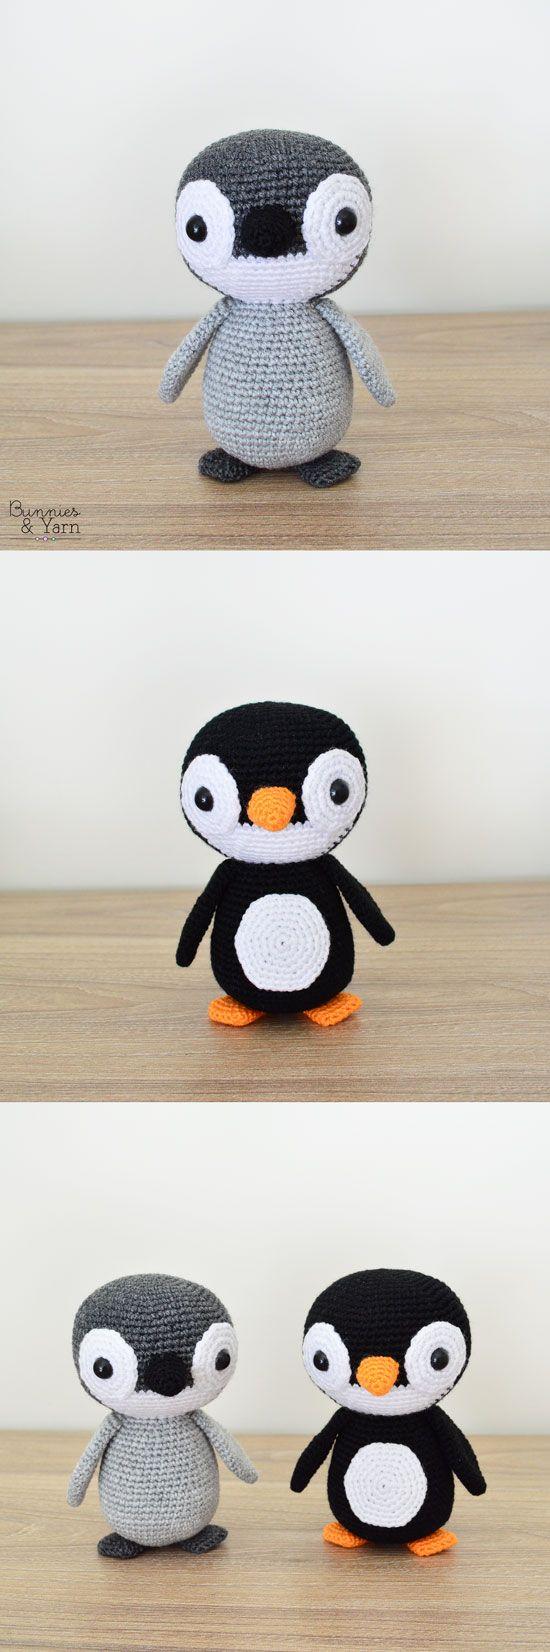 Crochet Pattern - Yves the Lovely Penguin - Amigurumi